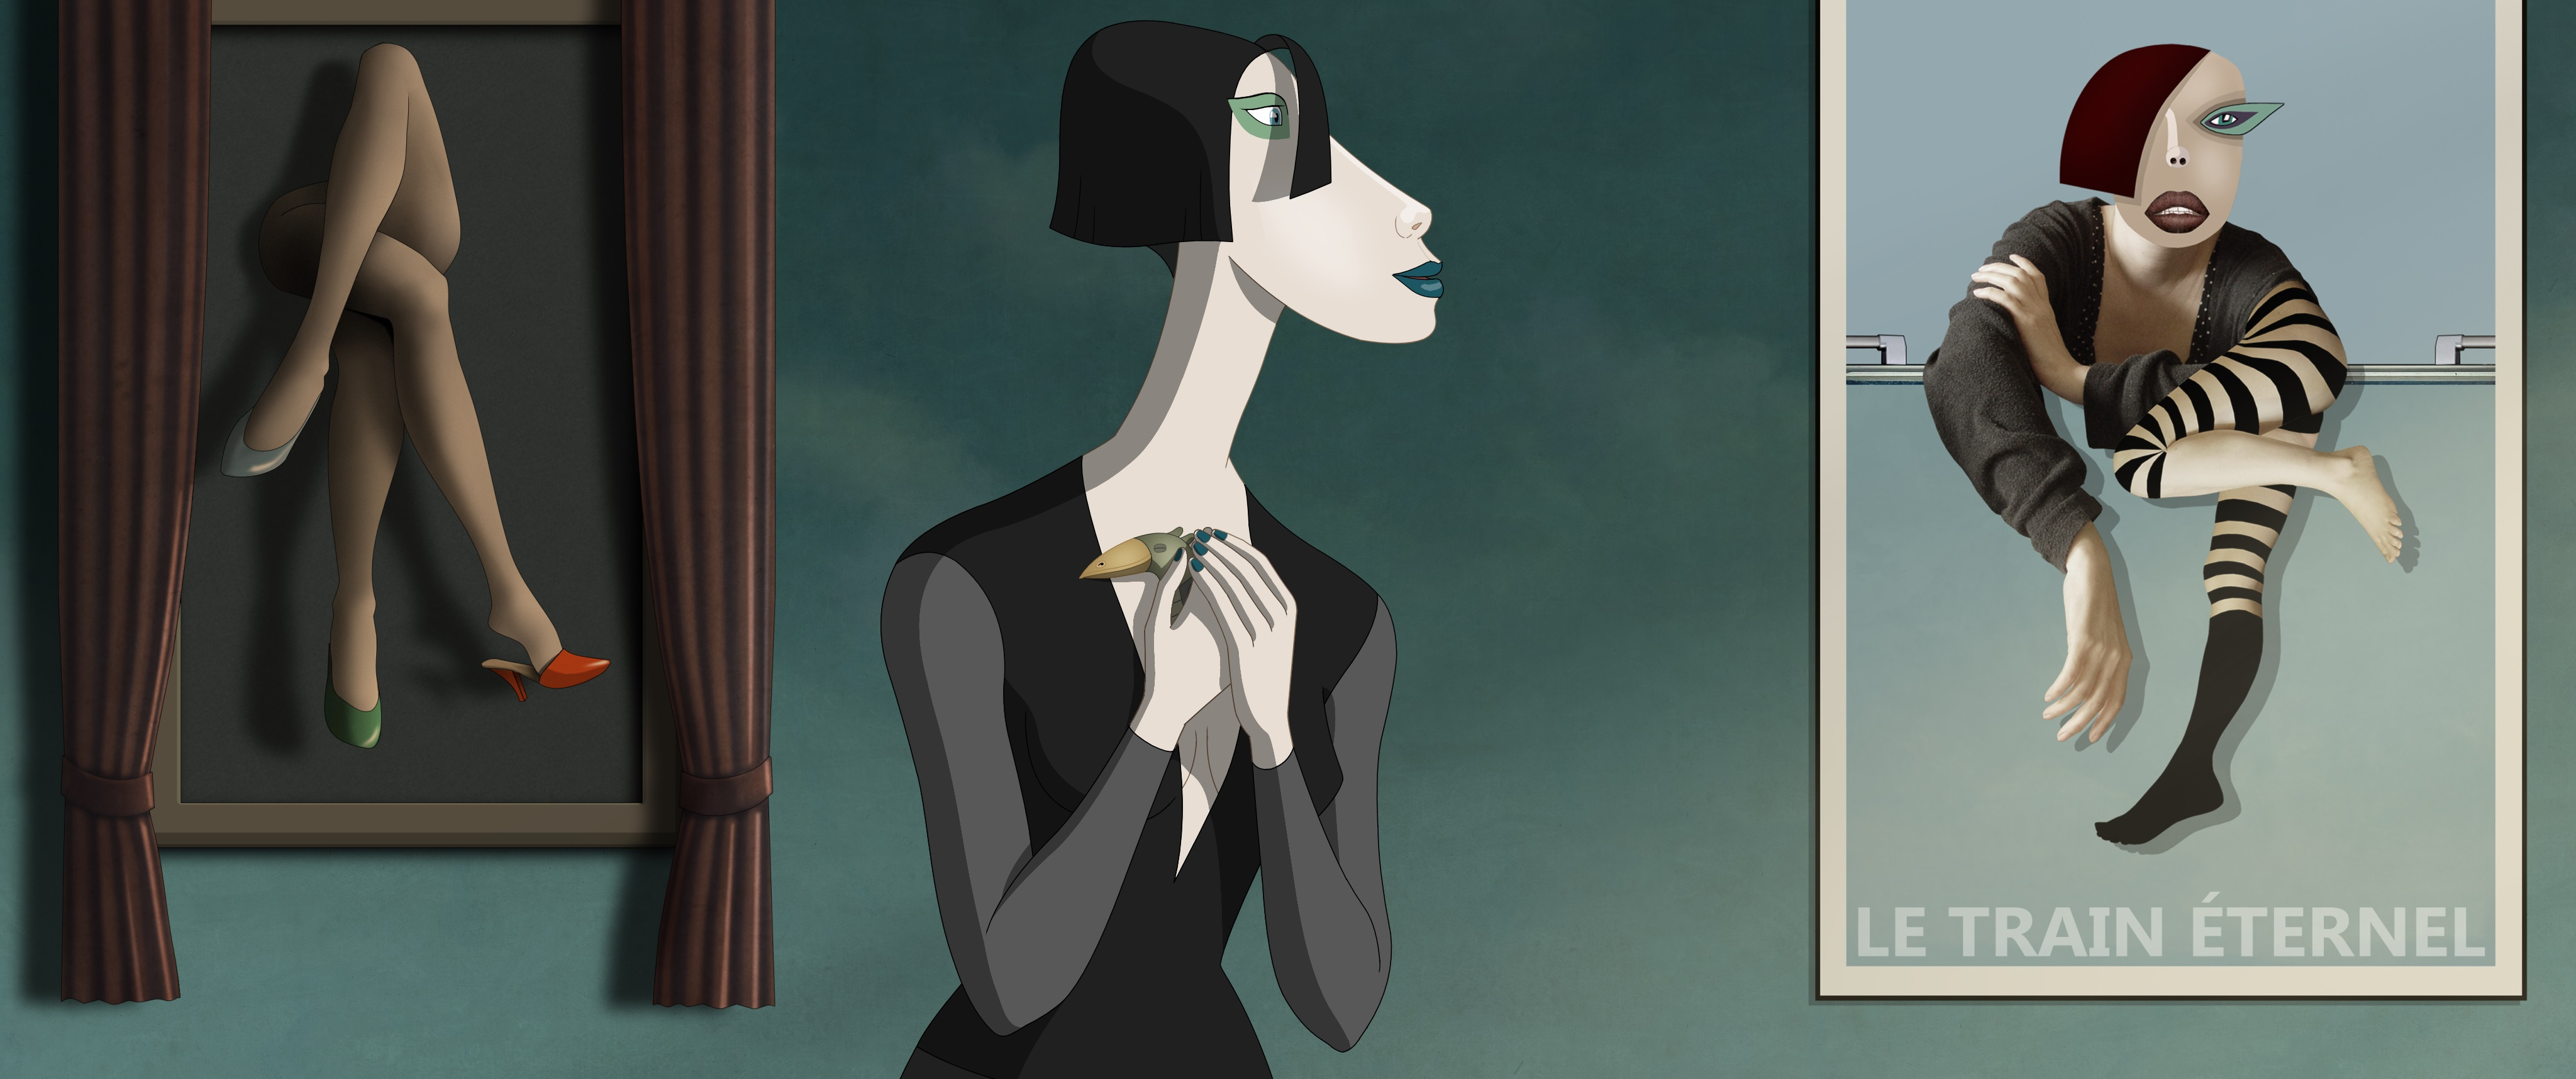 How Ruben Brandt, Collector turns fine art into an animated heist movie